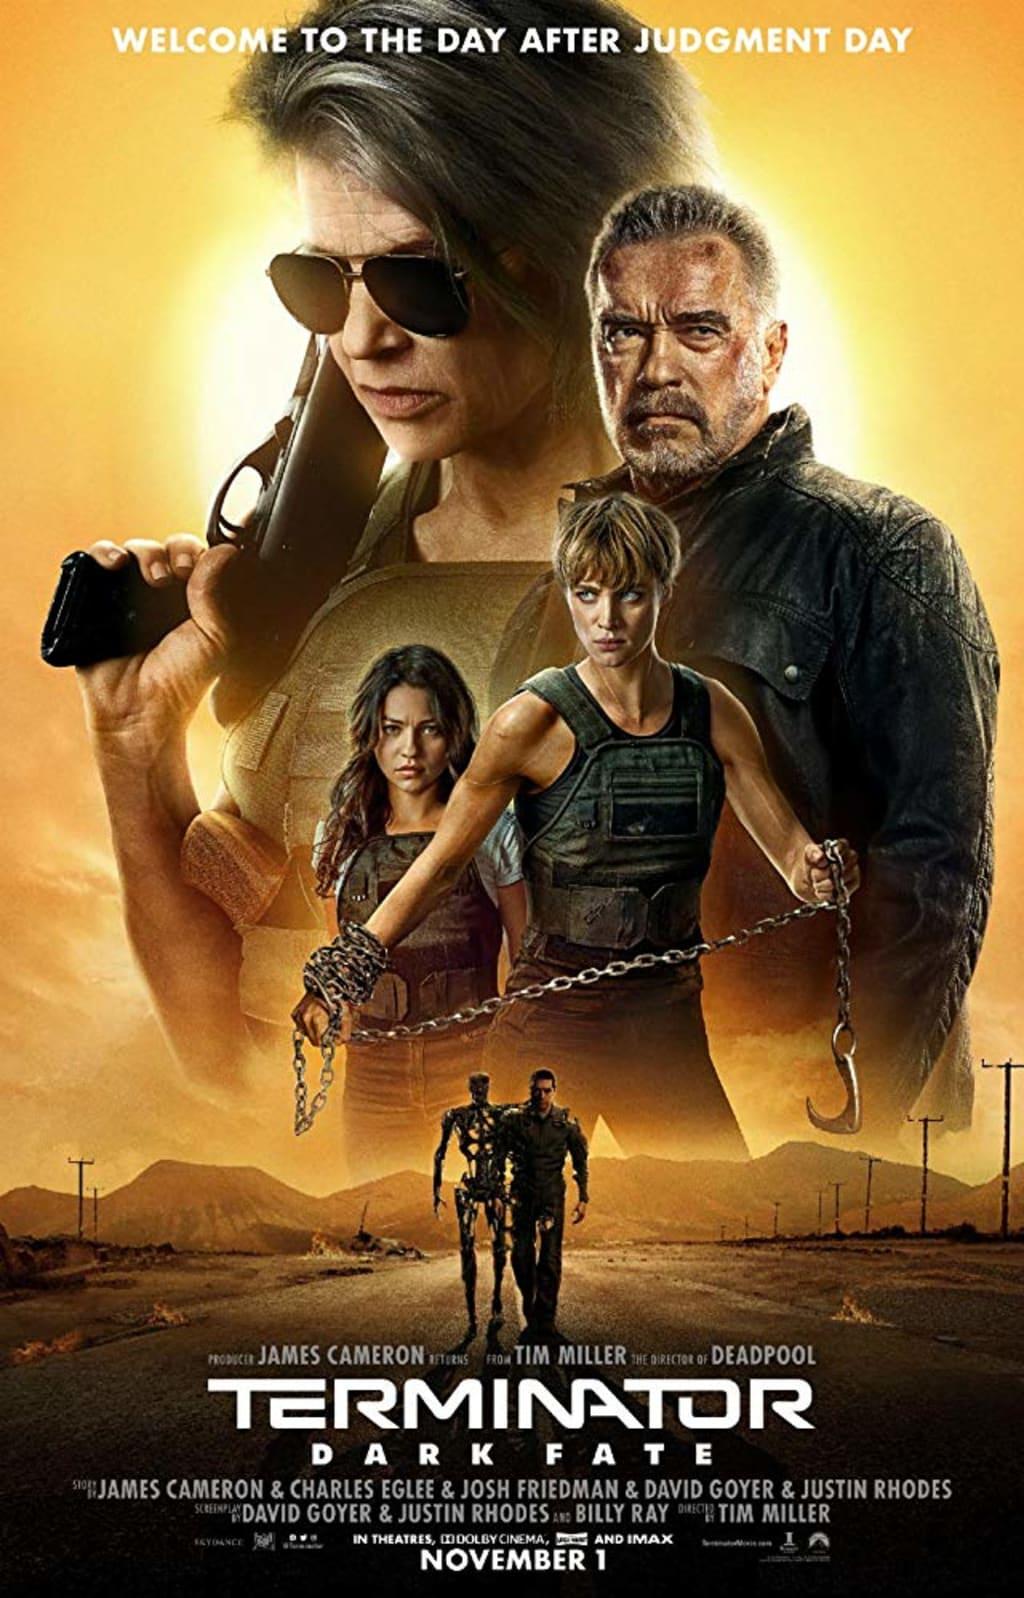 Review of 'Terminator: Dark Fate'